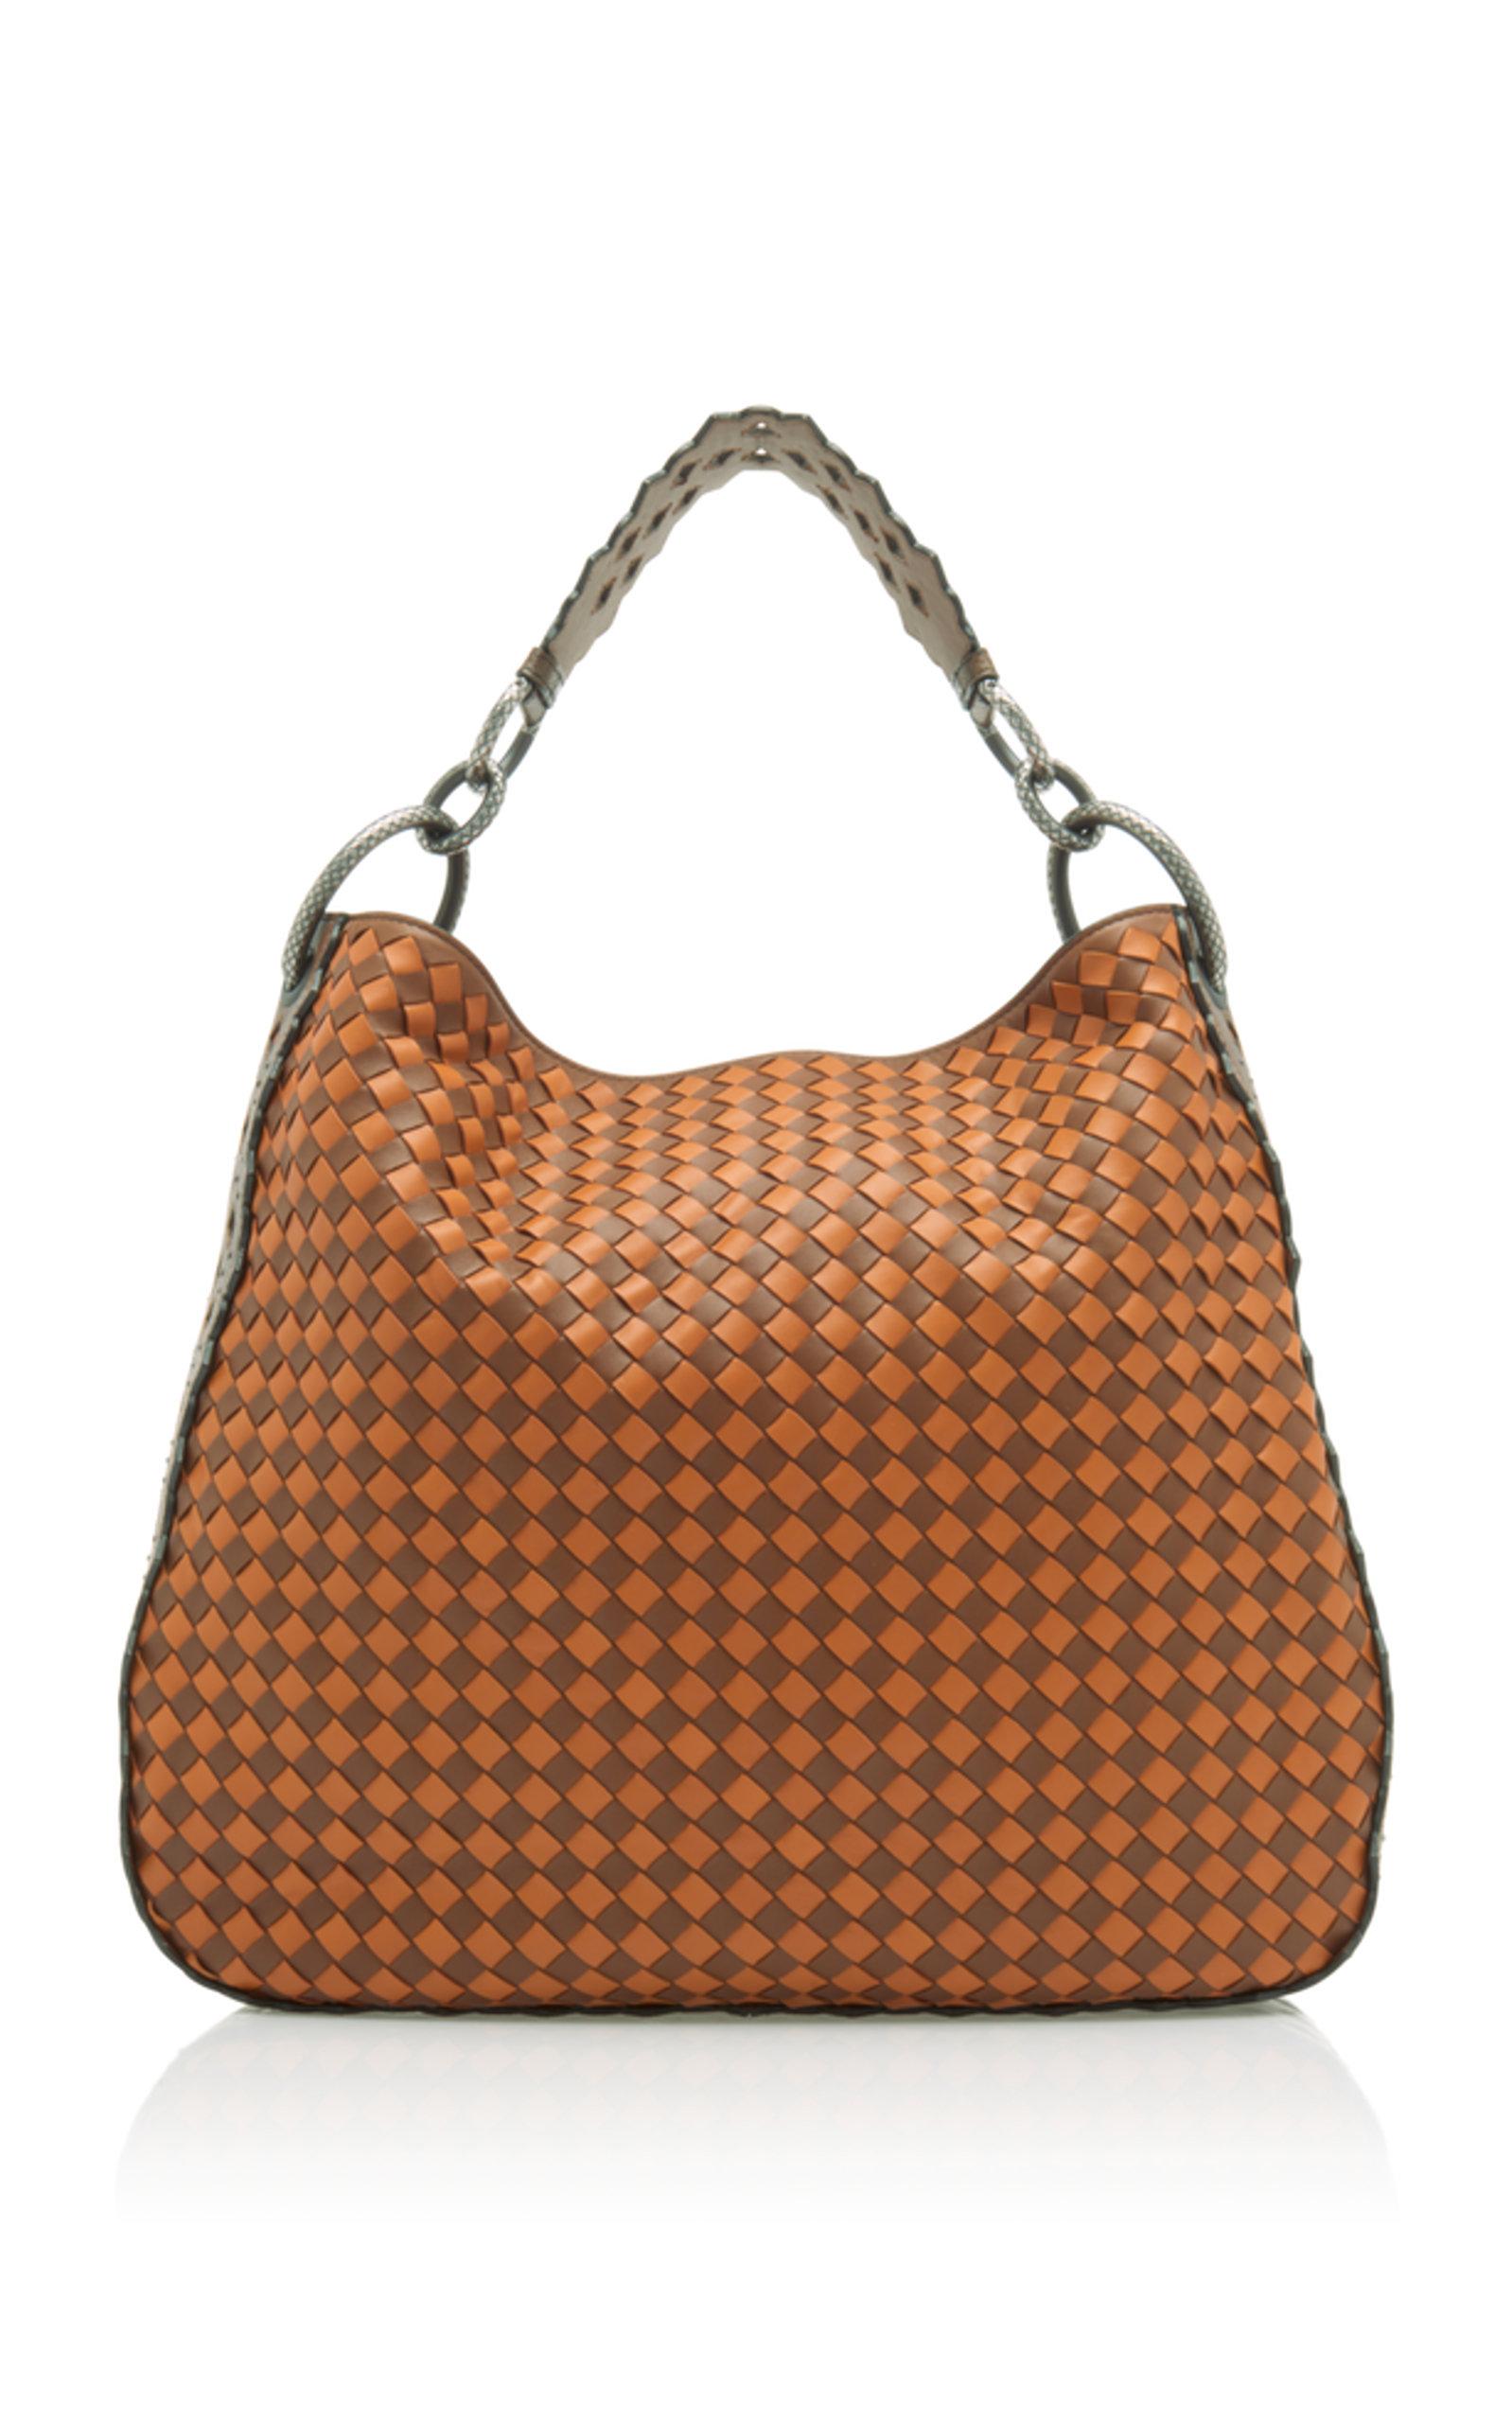 21baa06abdf6 Medium Loop Hobo Bag by Bottega Veneta